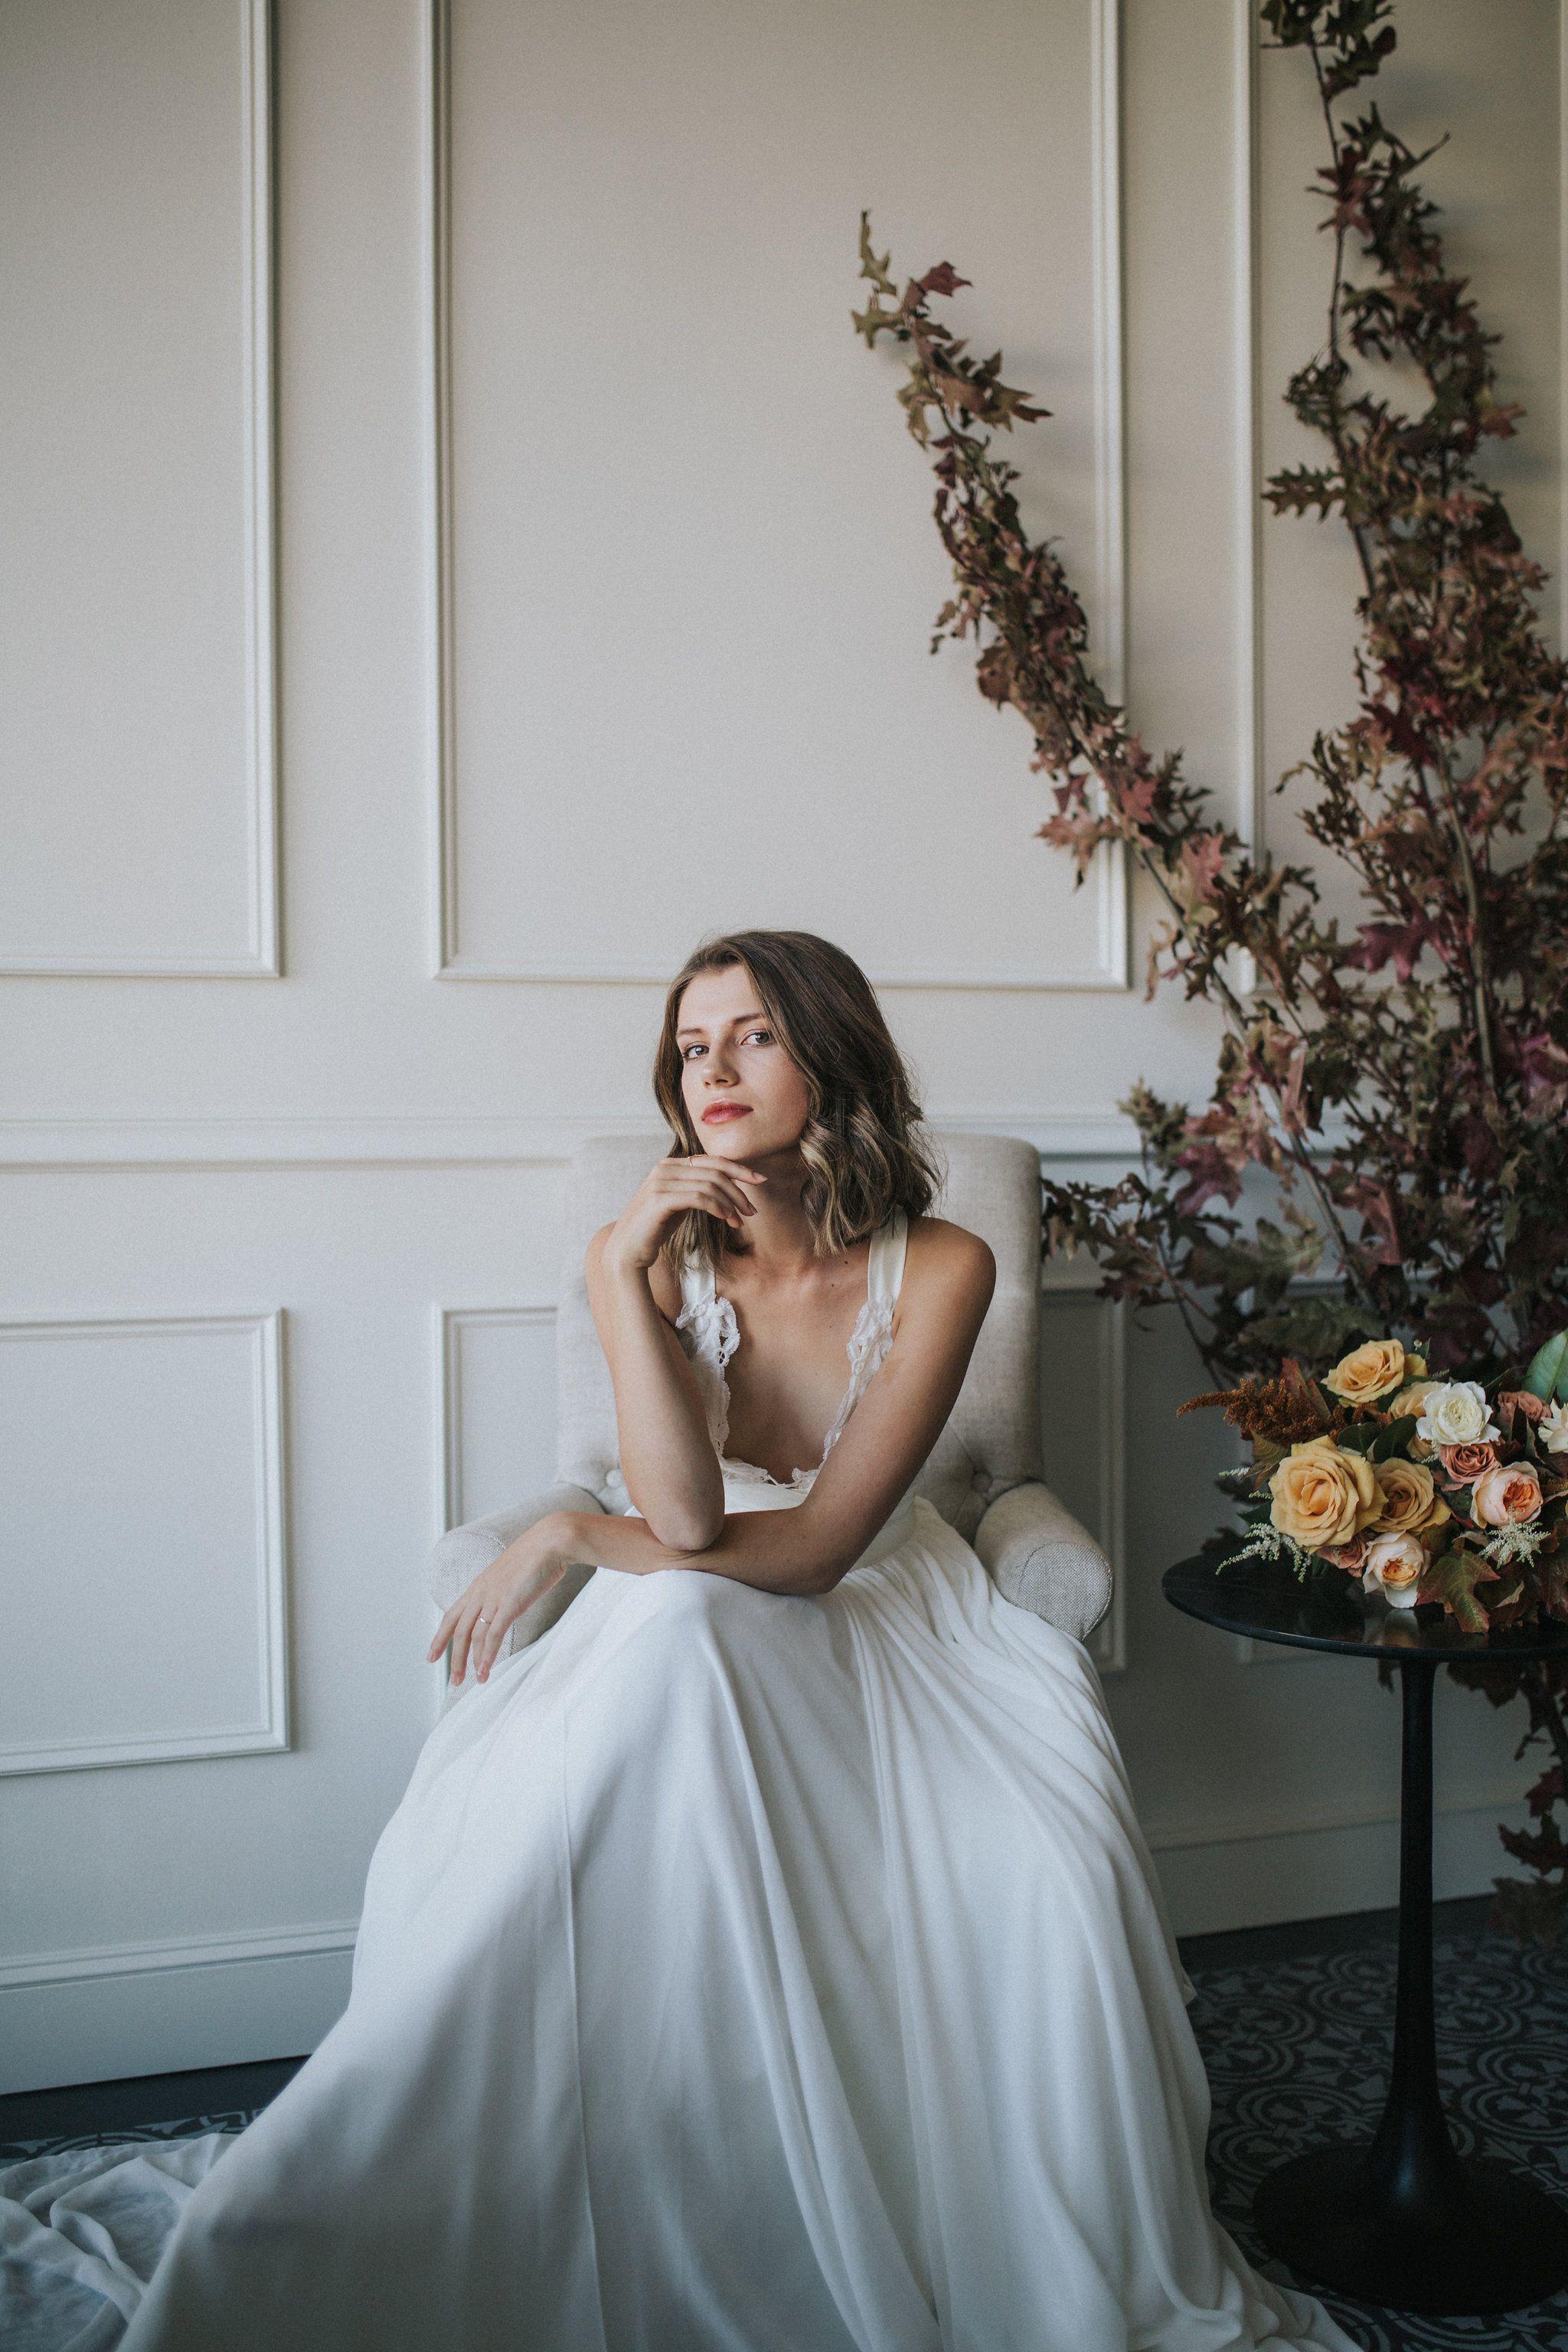 Portland Winter Wedding Inspiration at Tendue Co